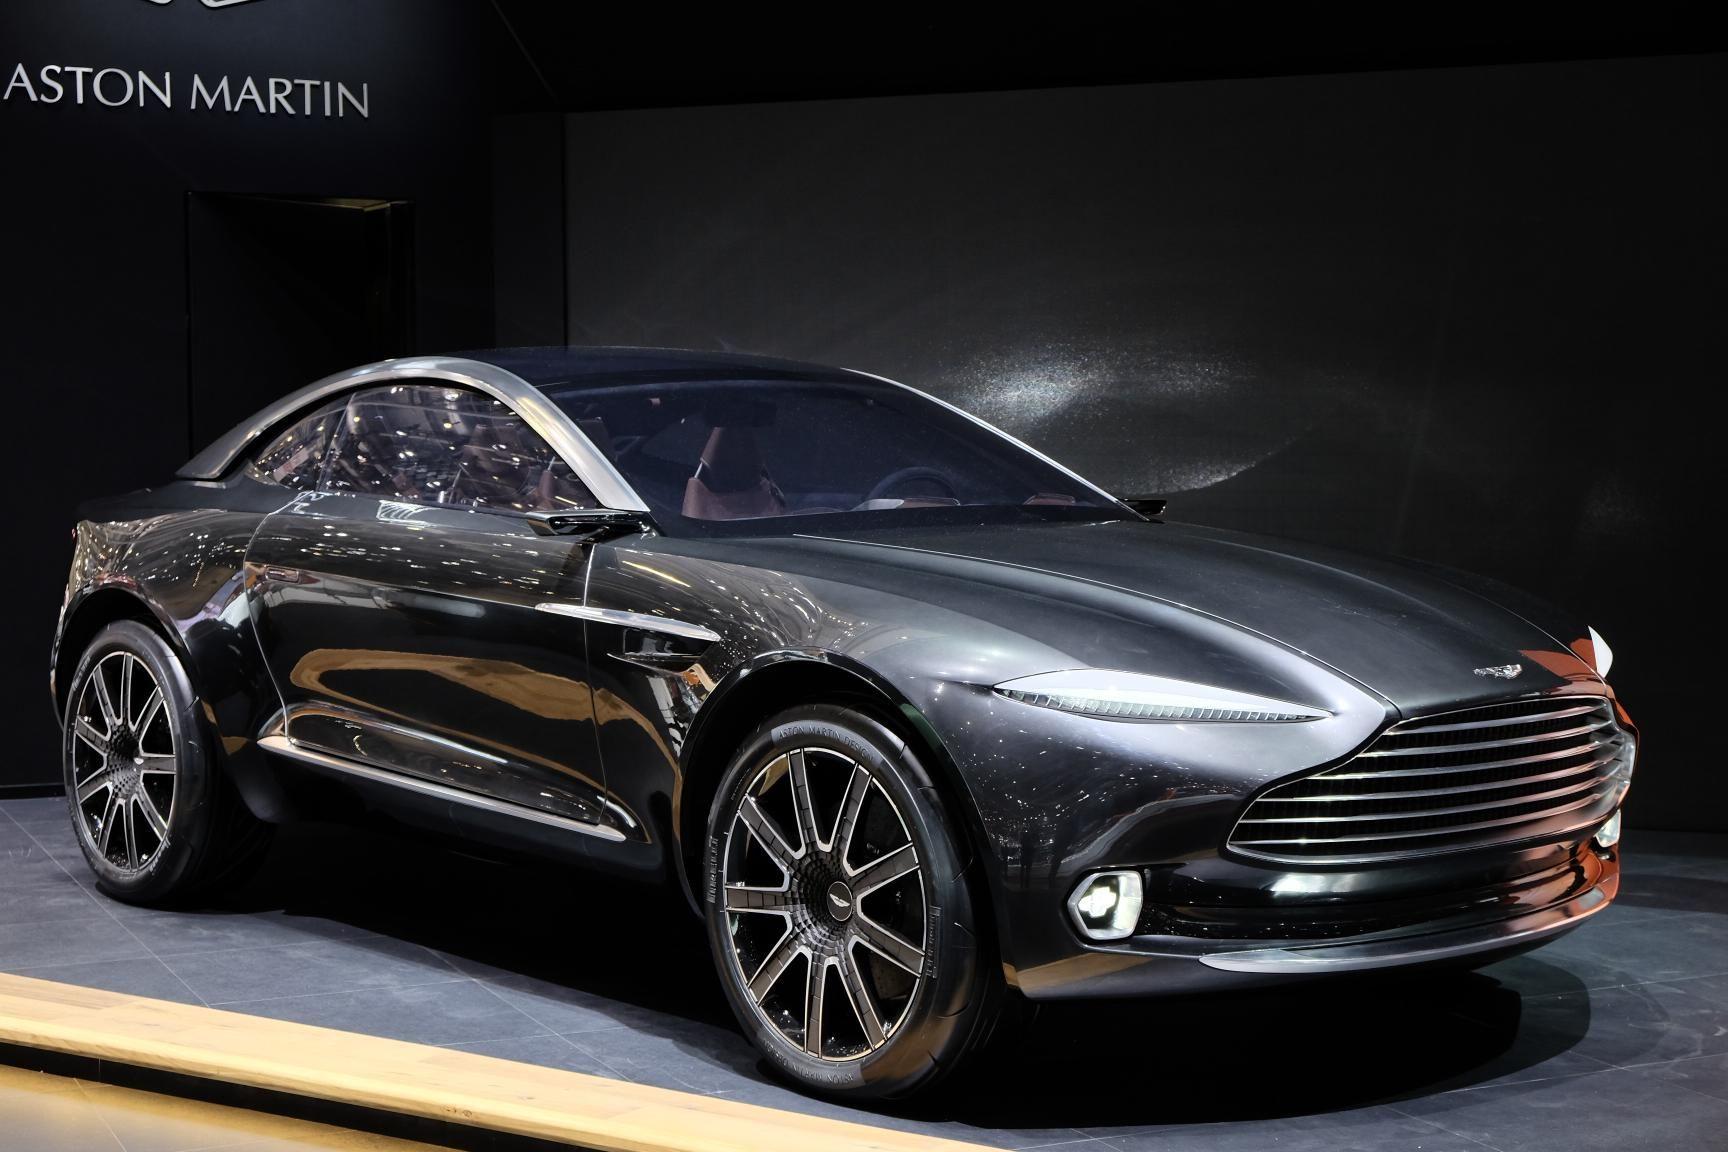 all-electric all-wheel drive aston martin dbx concept | concept